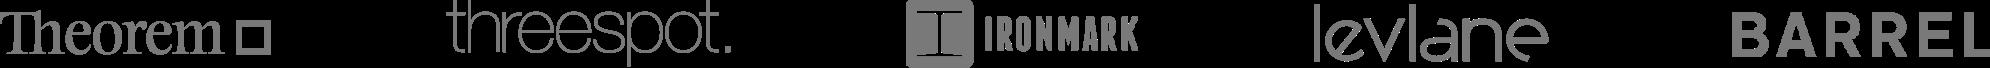 agency logos